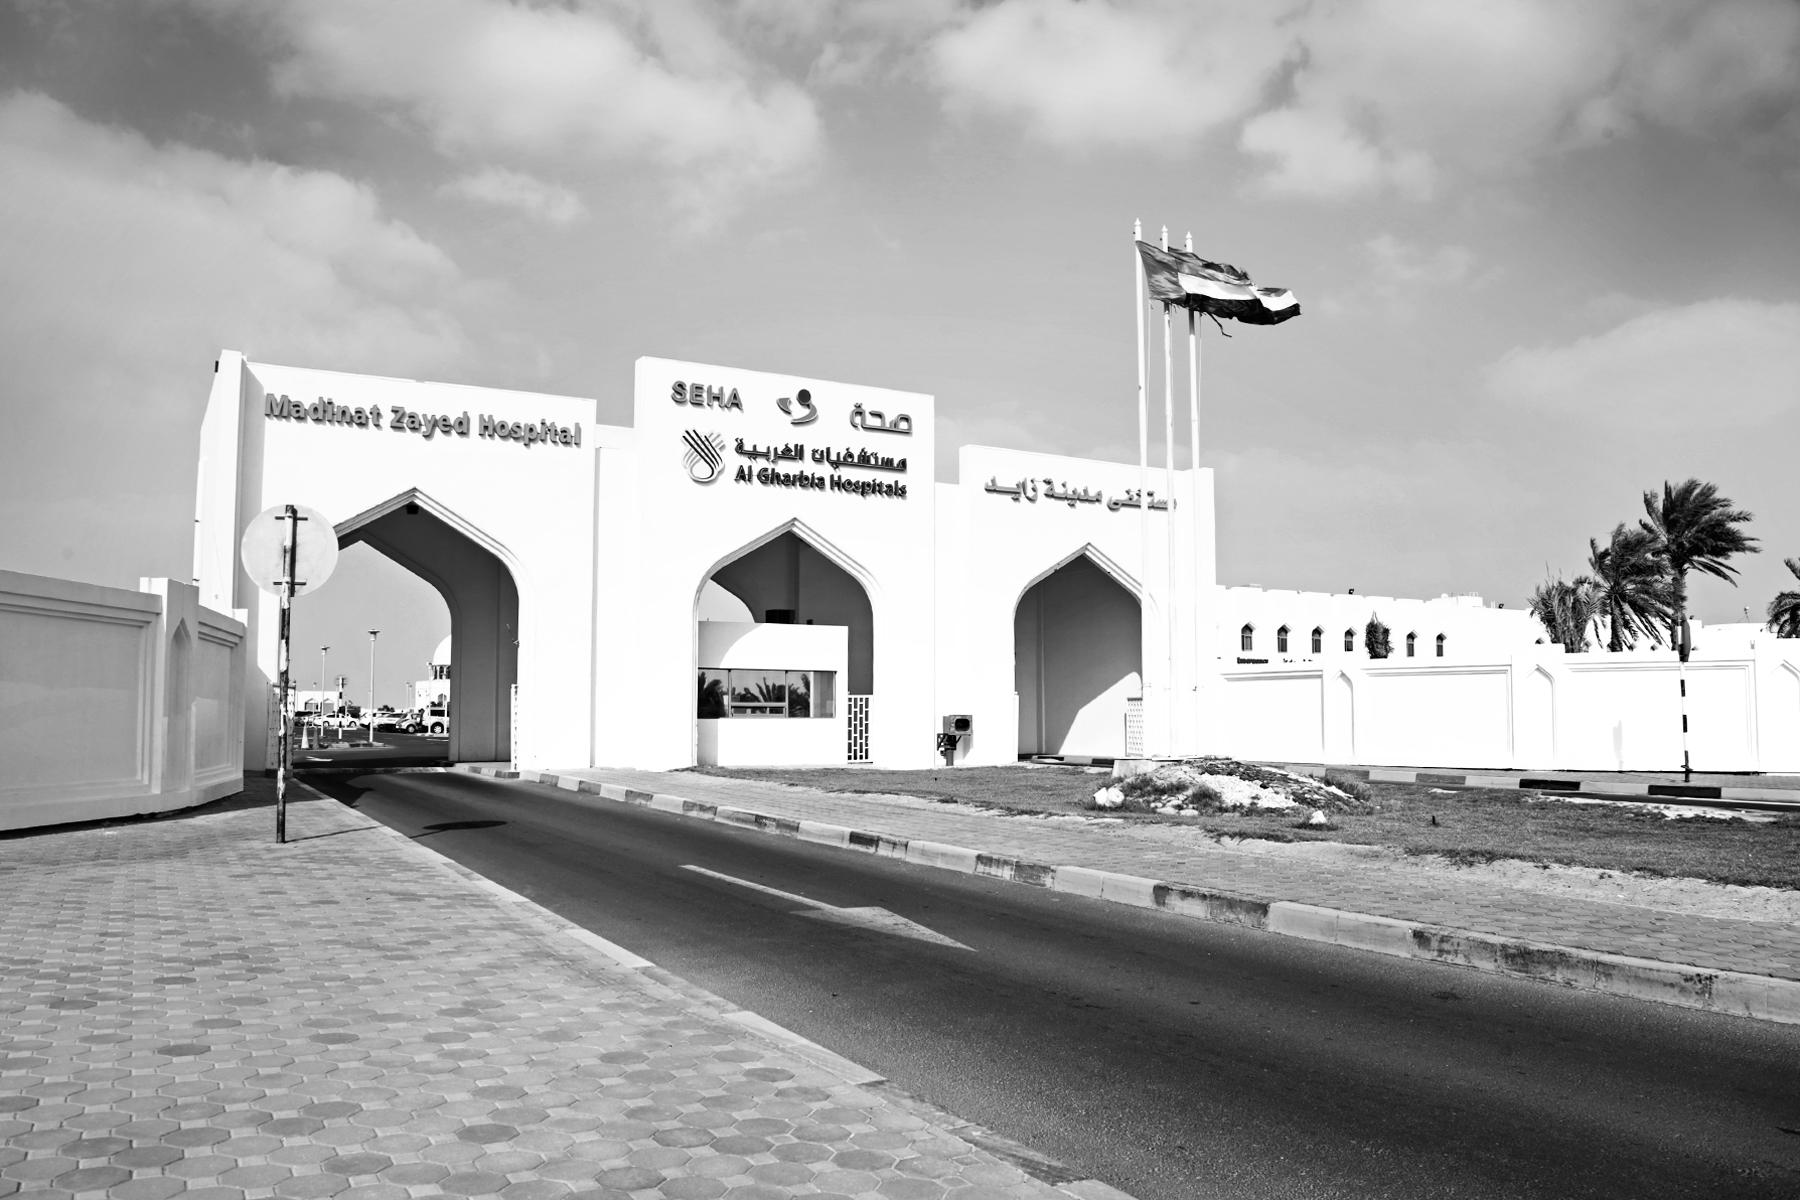 Seha Hospital Al Gharbia Western Region By Fl Pacheco